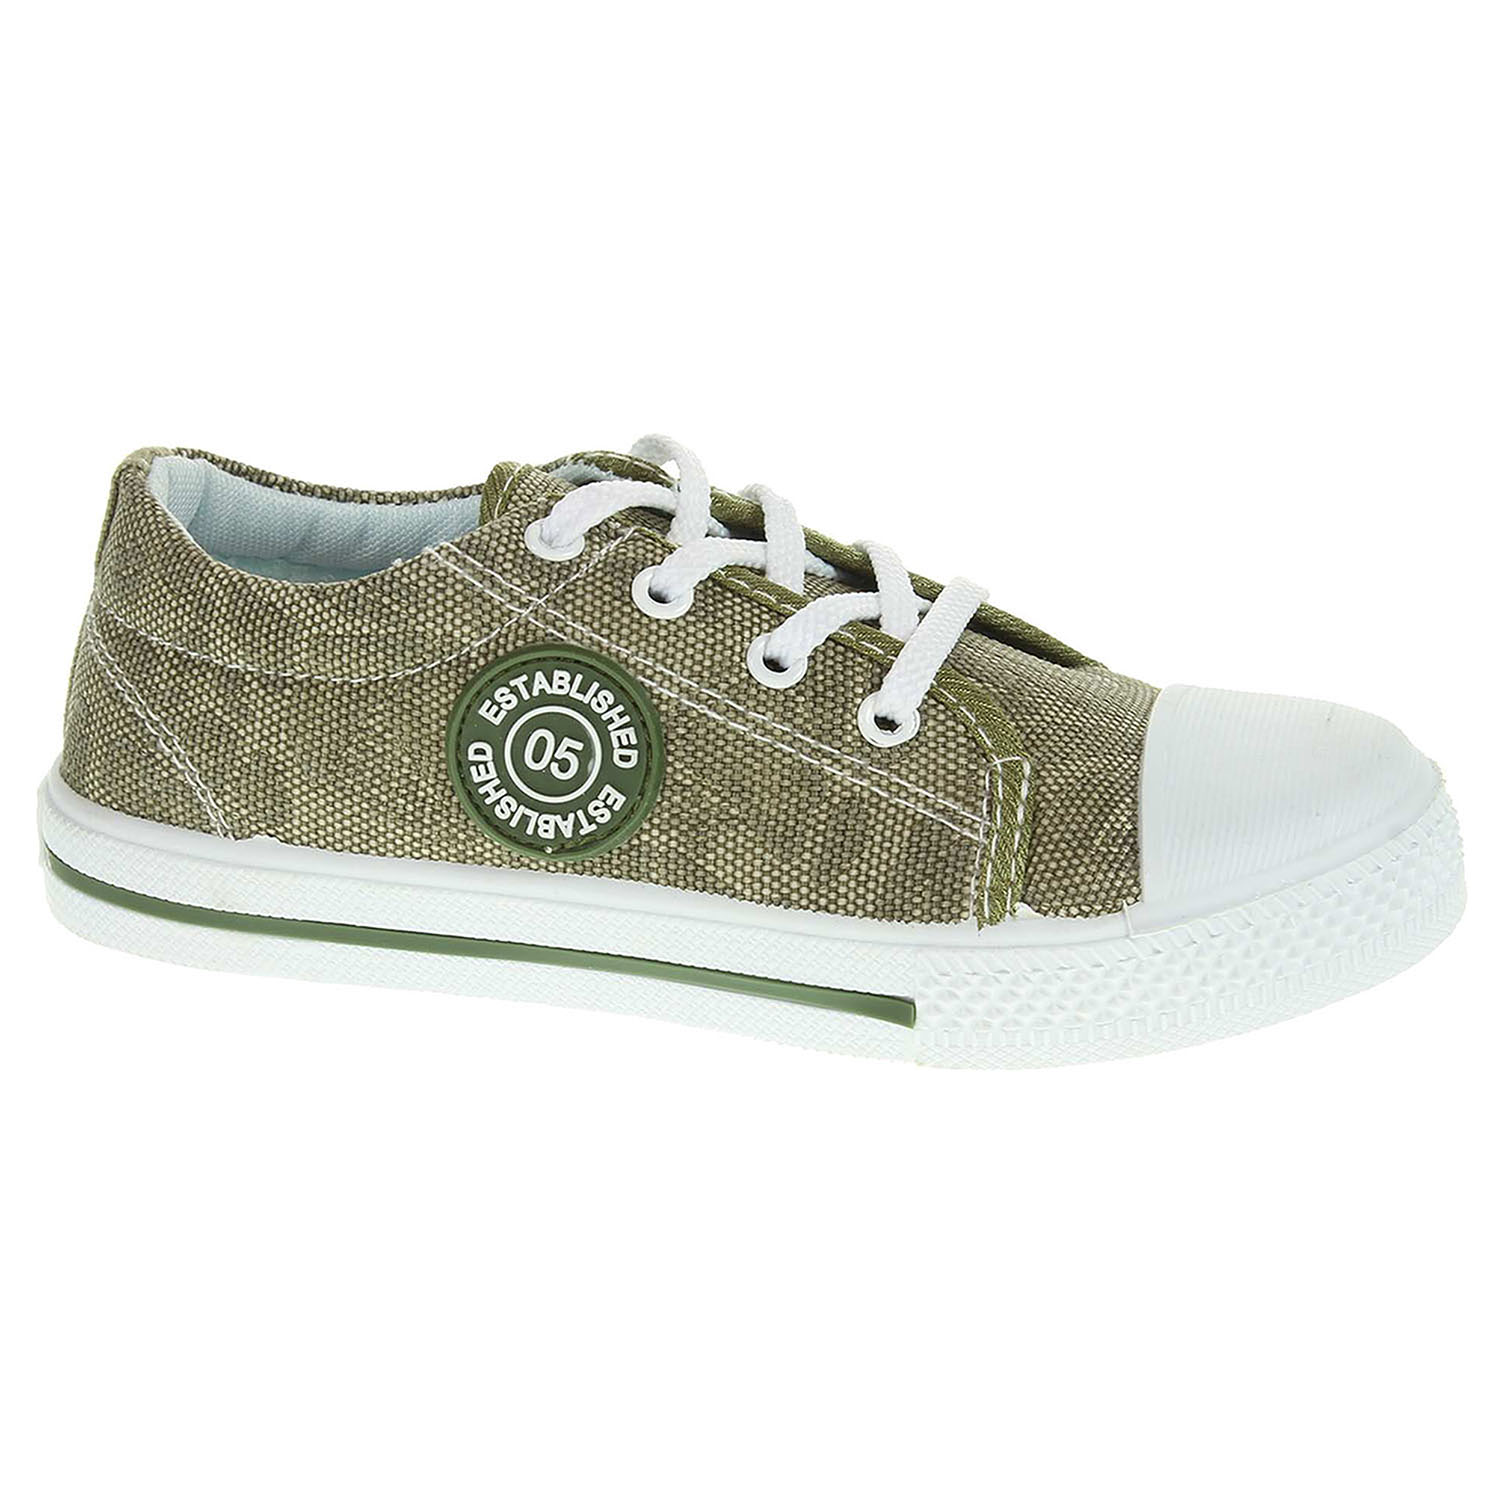 0cf179c80b6ee Ecco Chlapecká obuv Peddy PU-501-28-37 zelená 29700084